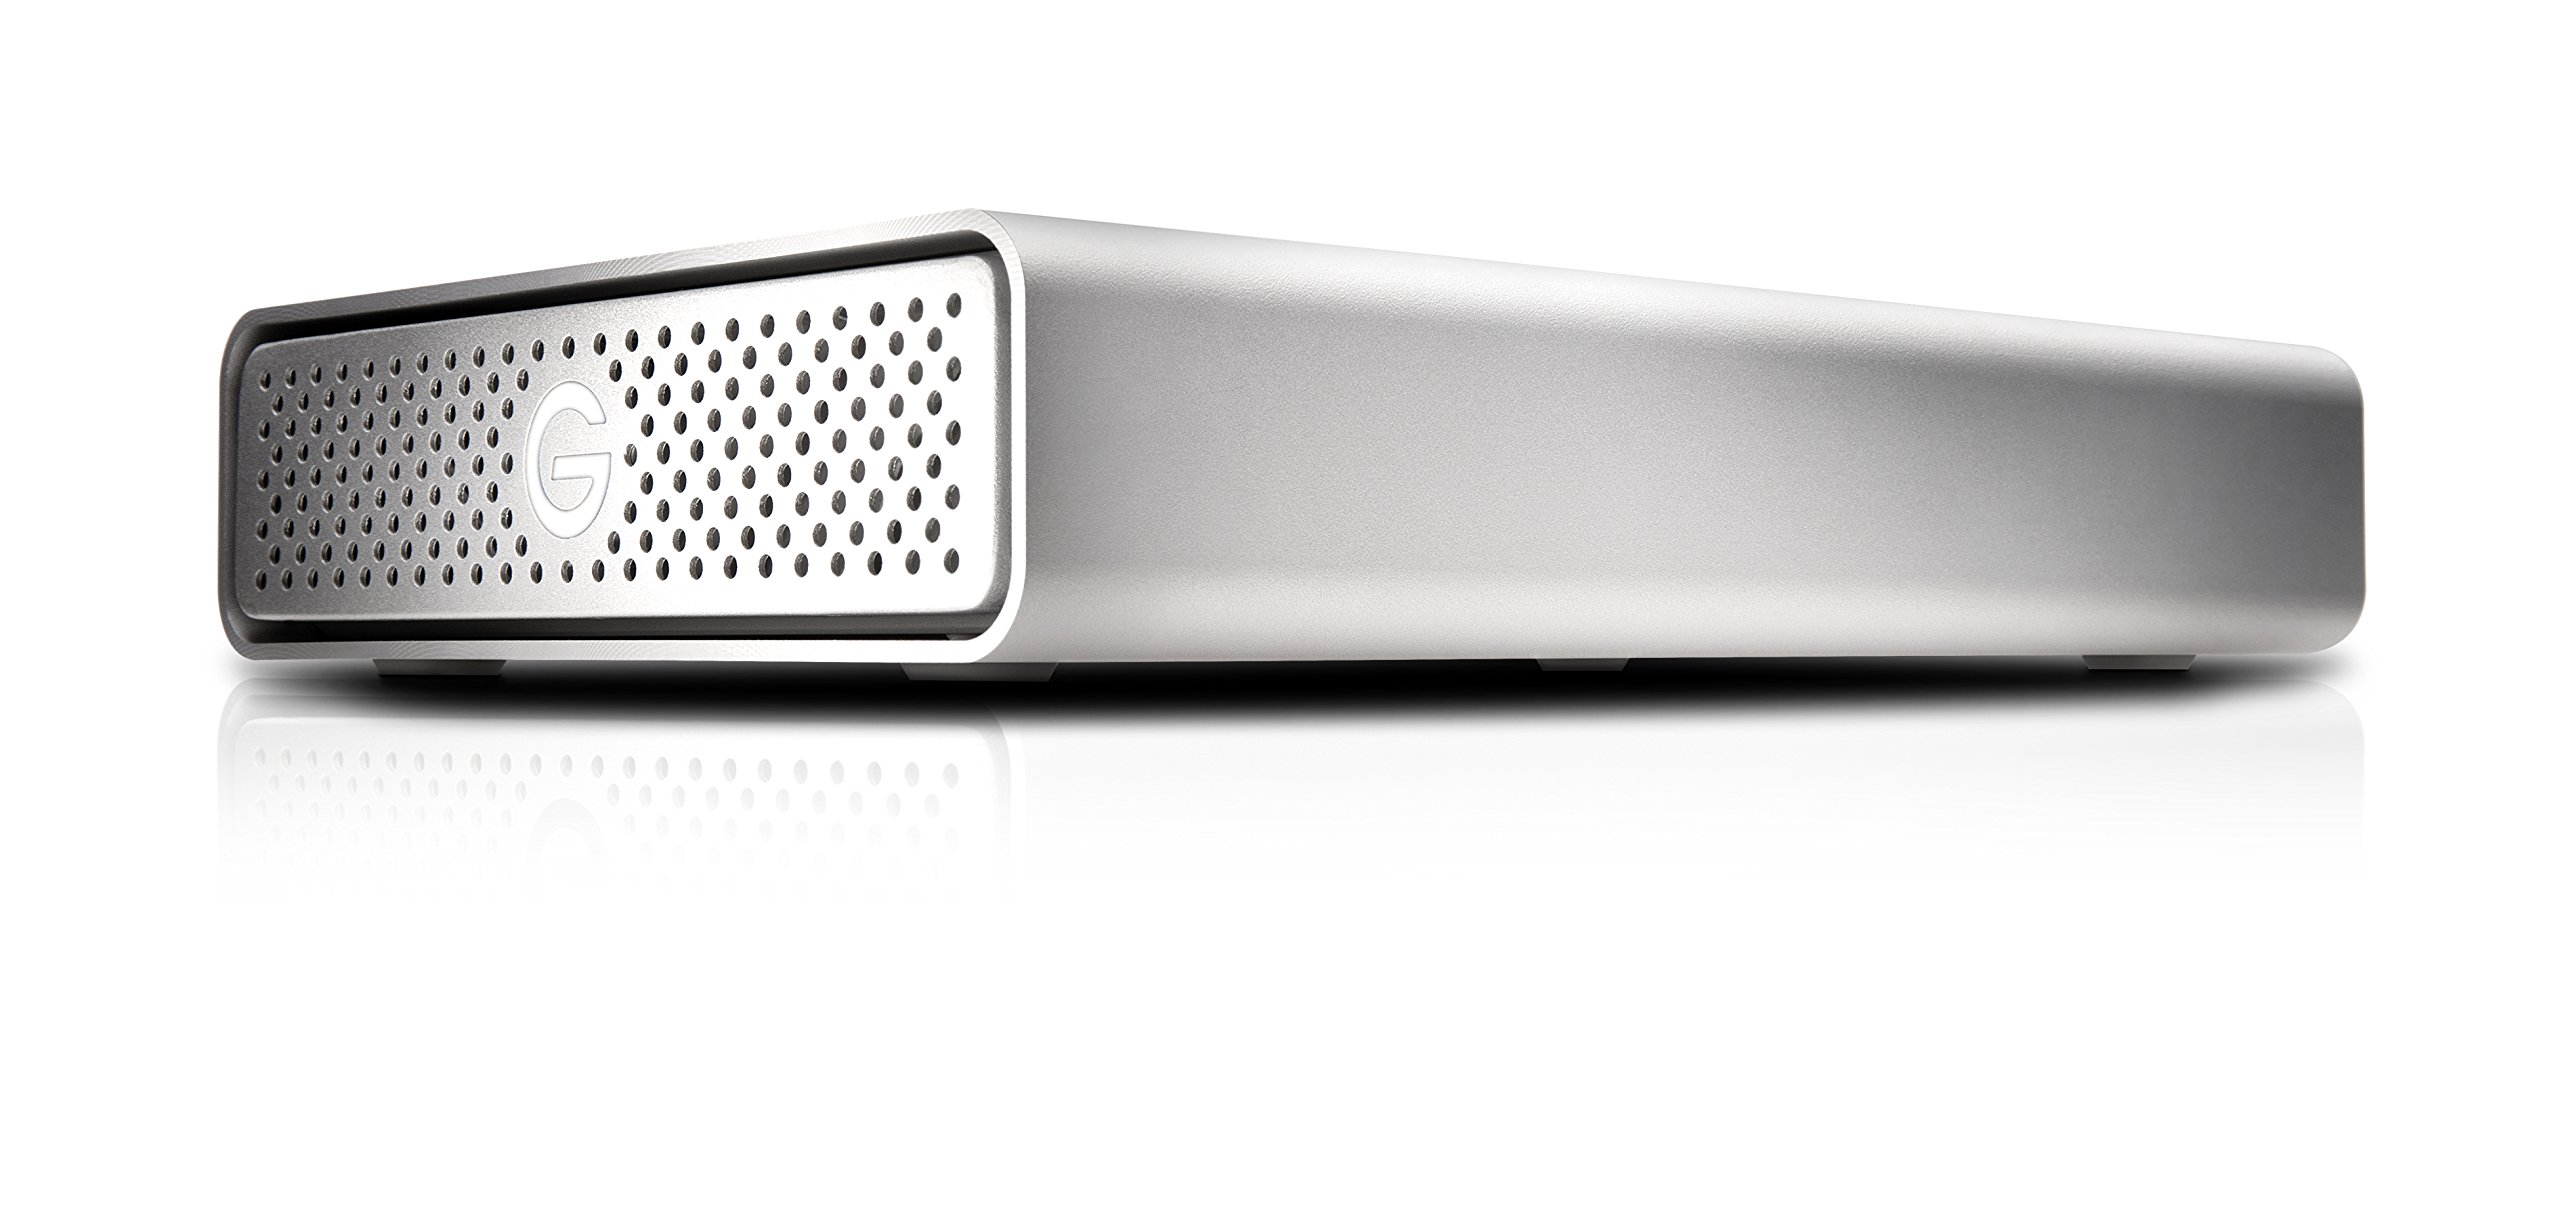 G-Technology G-DRIVE USB-C External Drive 4TB 0G05666 by G-Technology (Image #4)